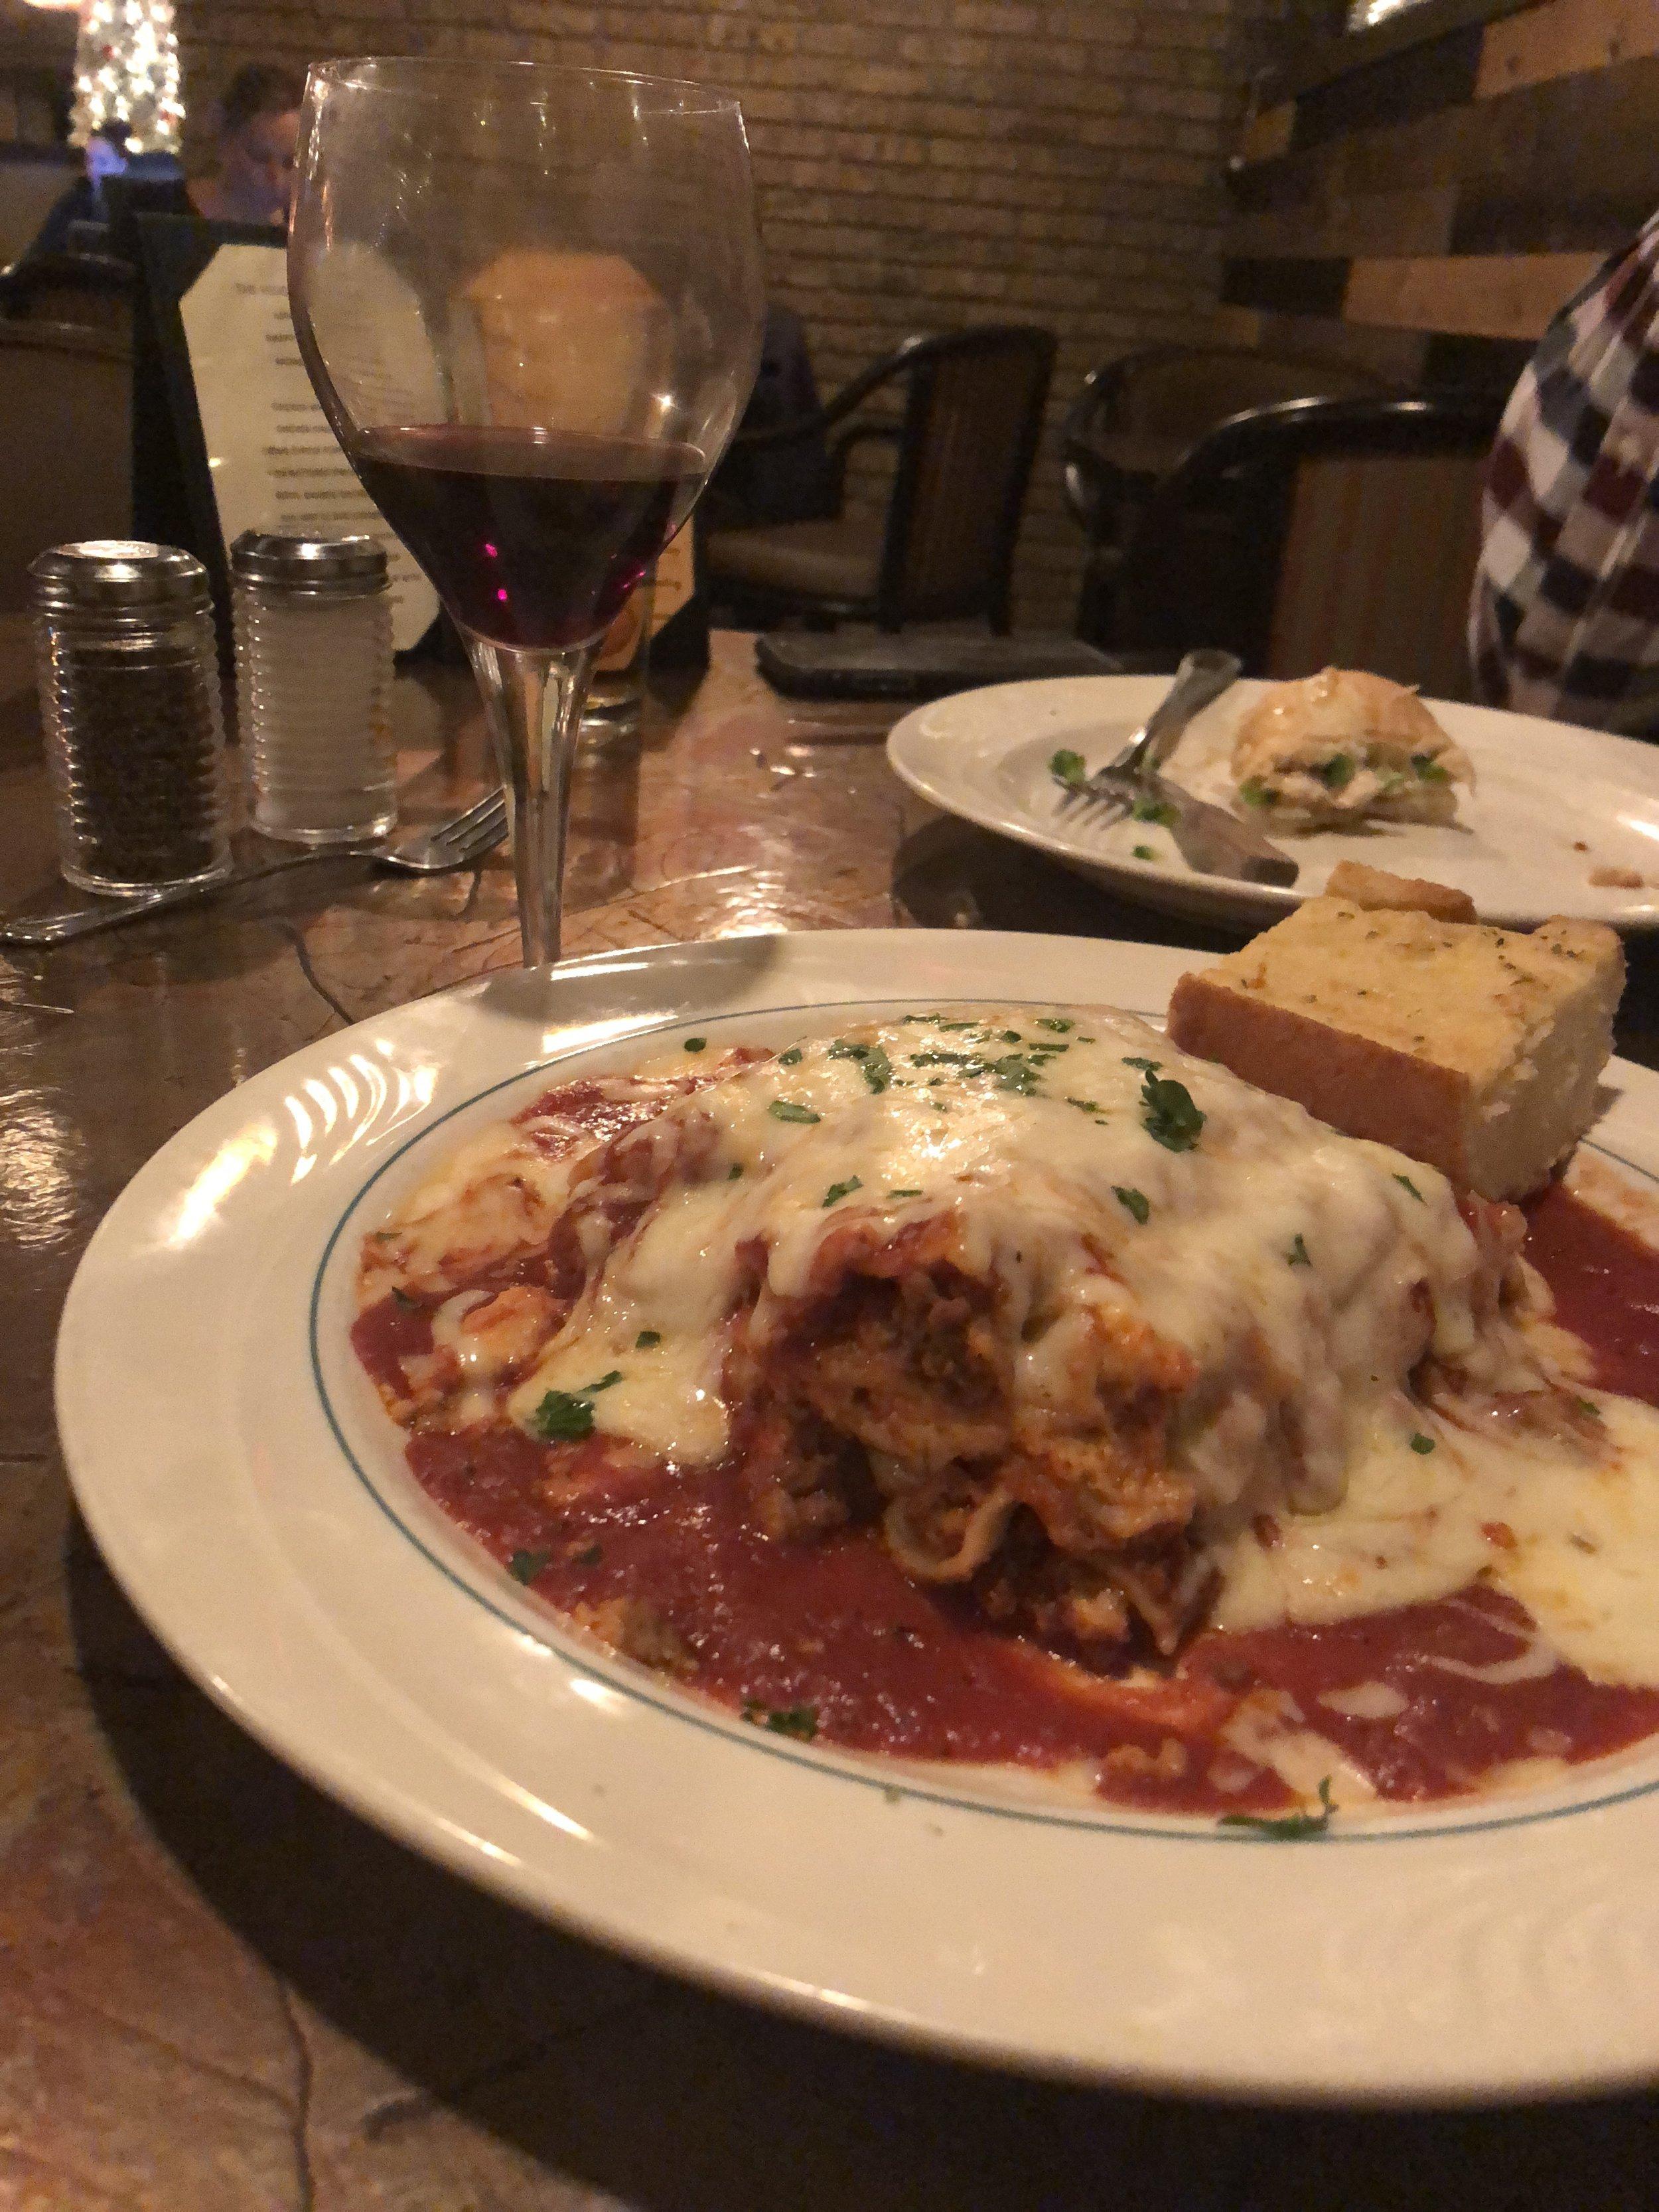 Delicious homemade lasagna